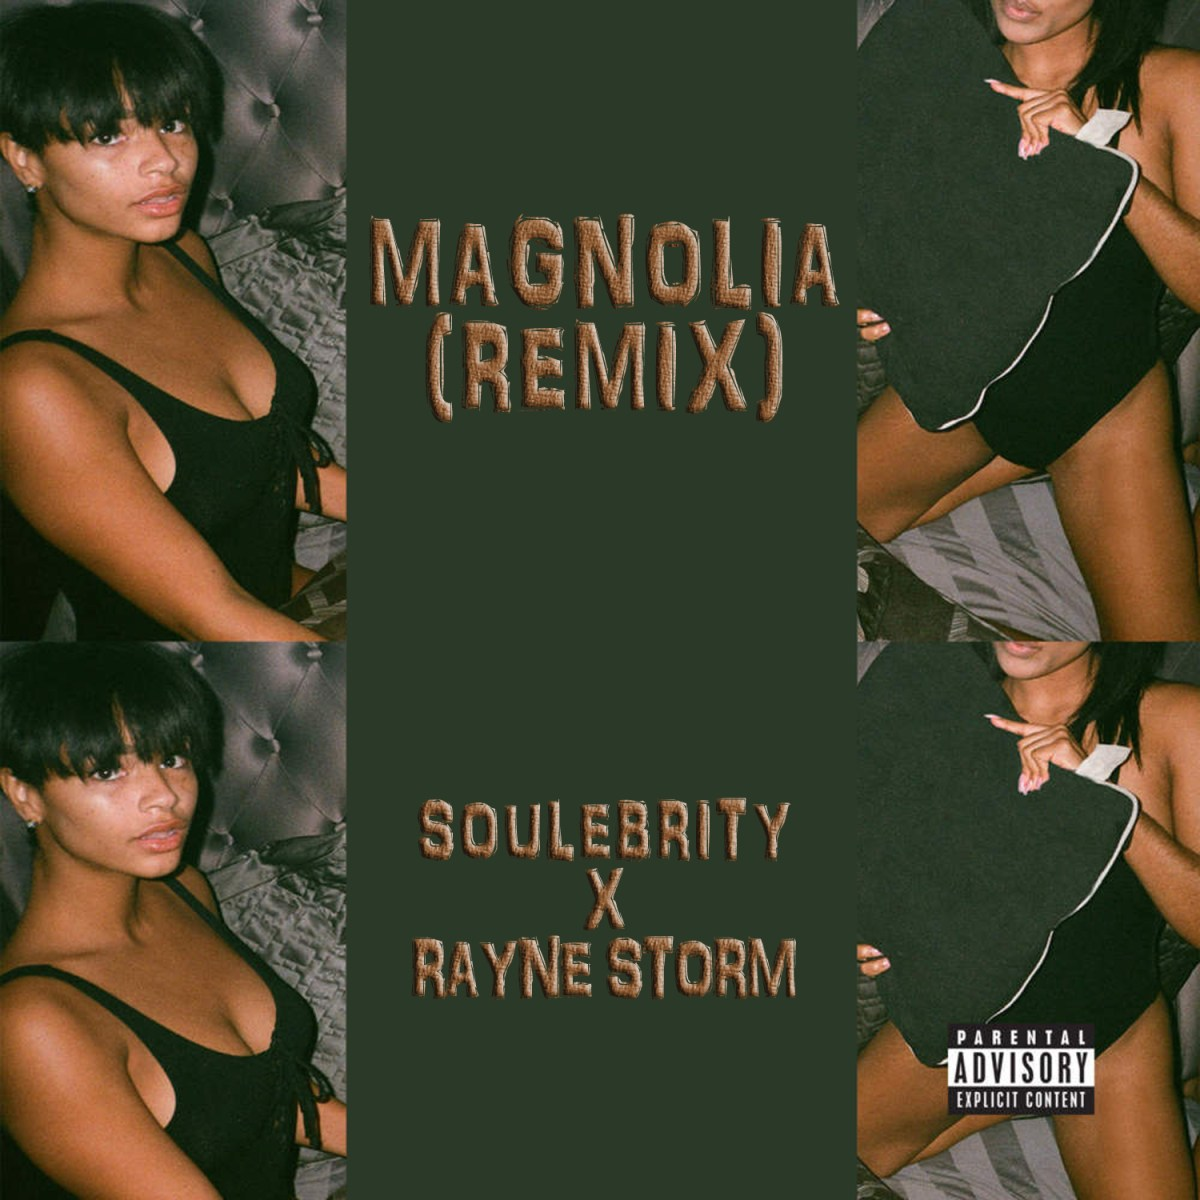 Soulebrity & Rayne Storm - Magnolia (Remix)